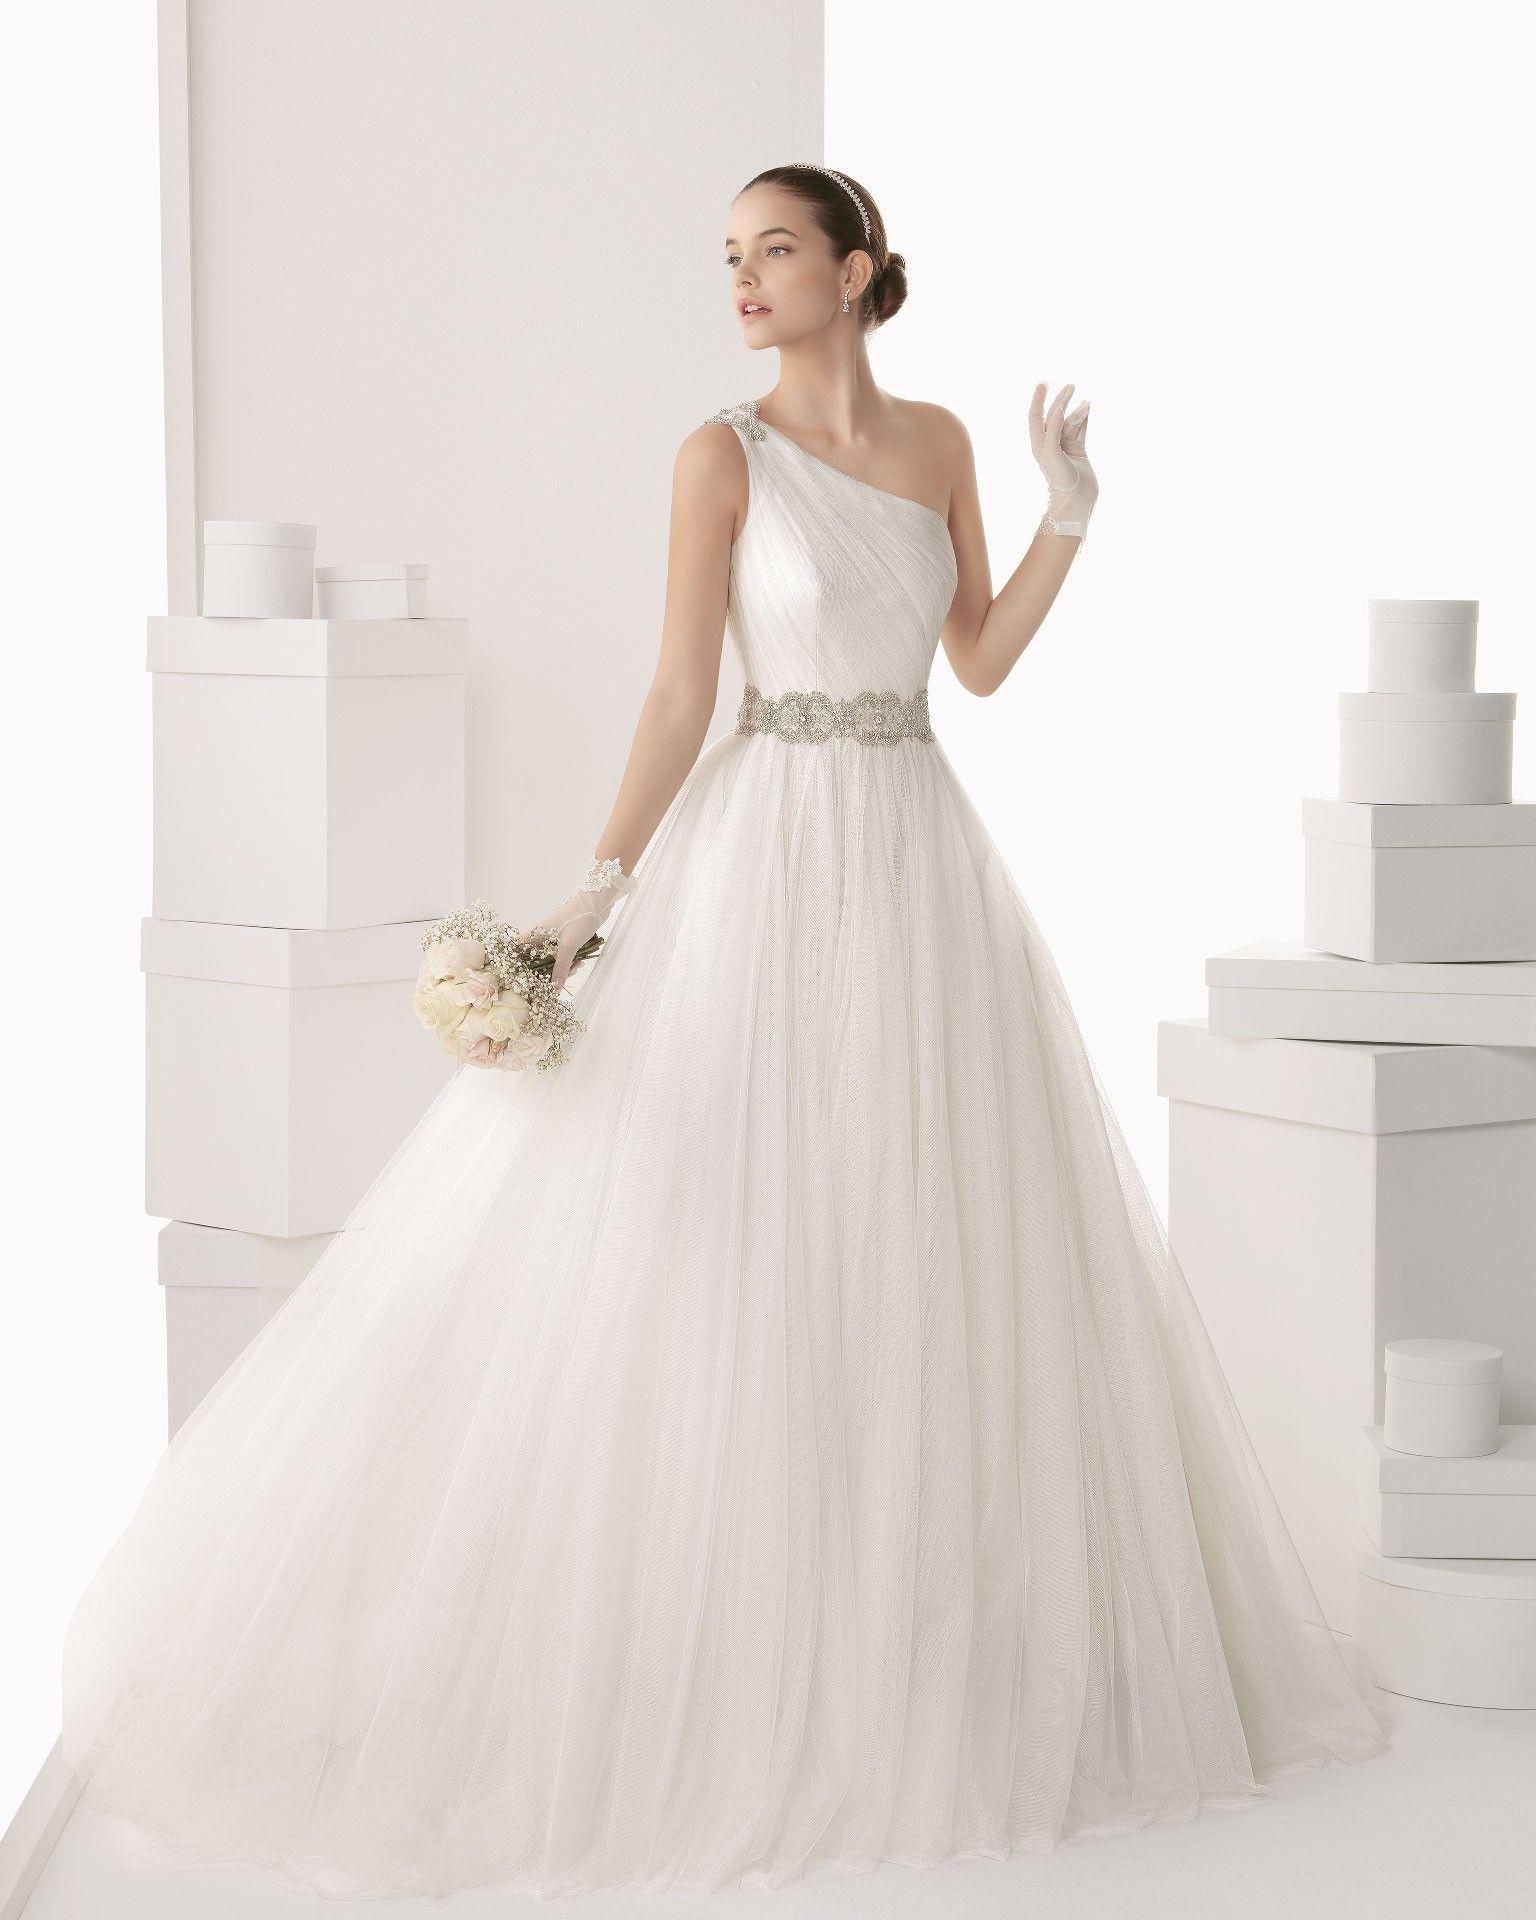 Beautiful Tulle One Shoulder Chapel Train Ball Gown Wedding Dress Wro